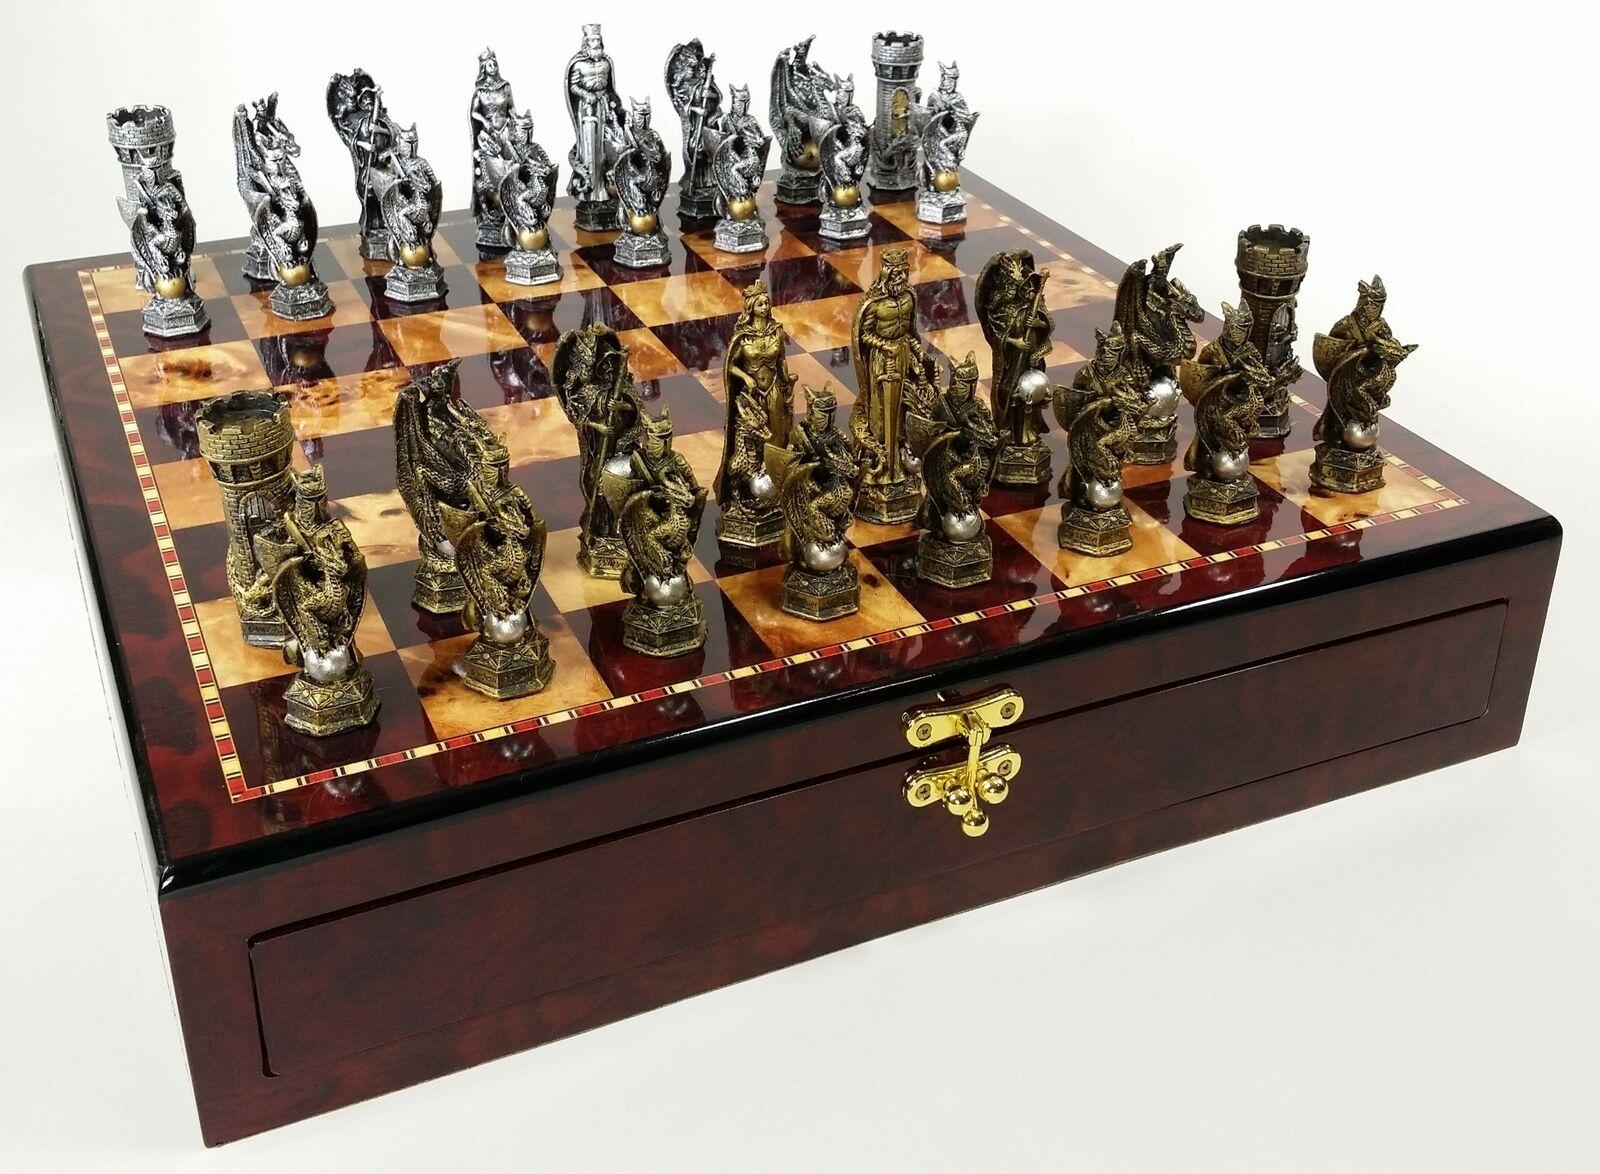 MEDIEVAL TIMES re ARTHUR Dragon fantasyc Chess Set Cherry Coloreeee STORAGE tavola